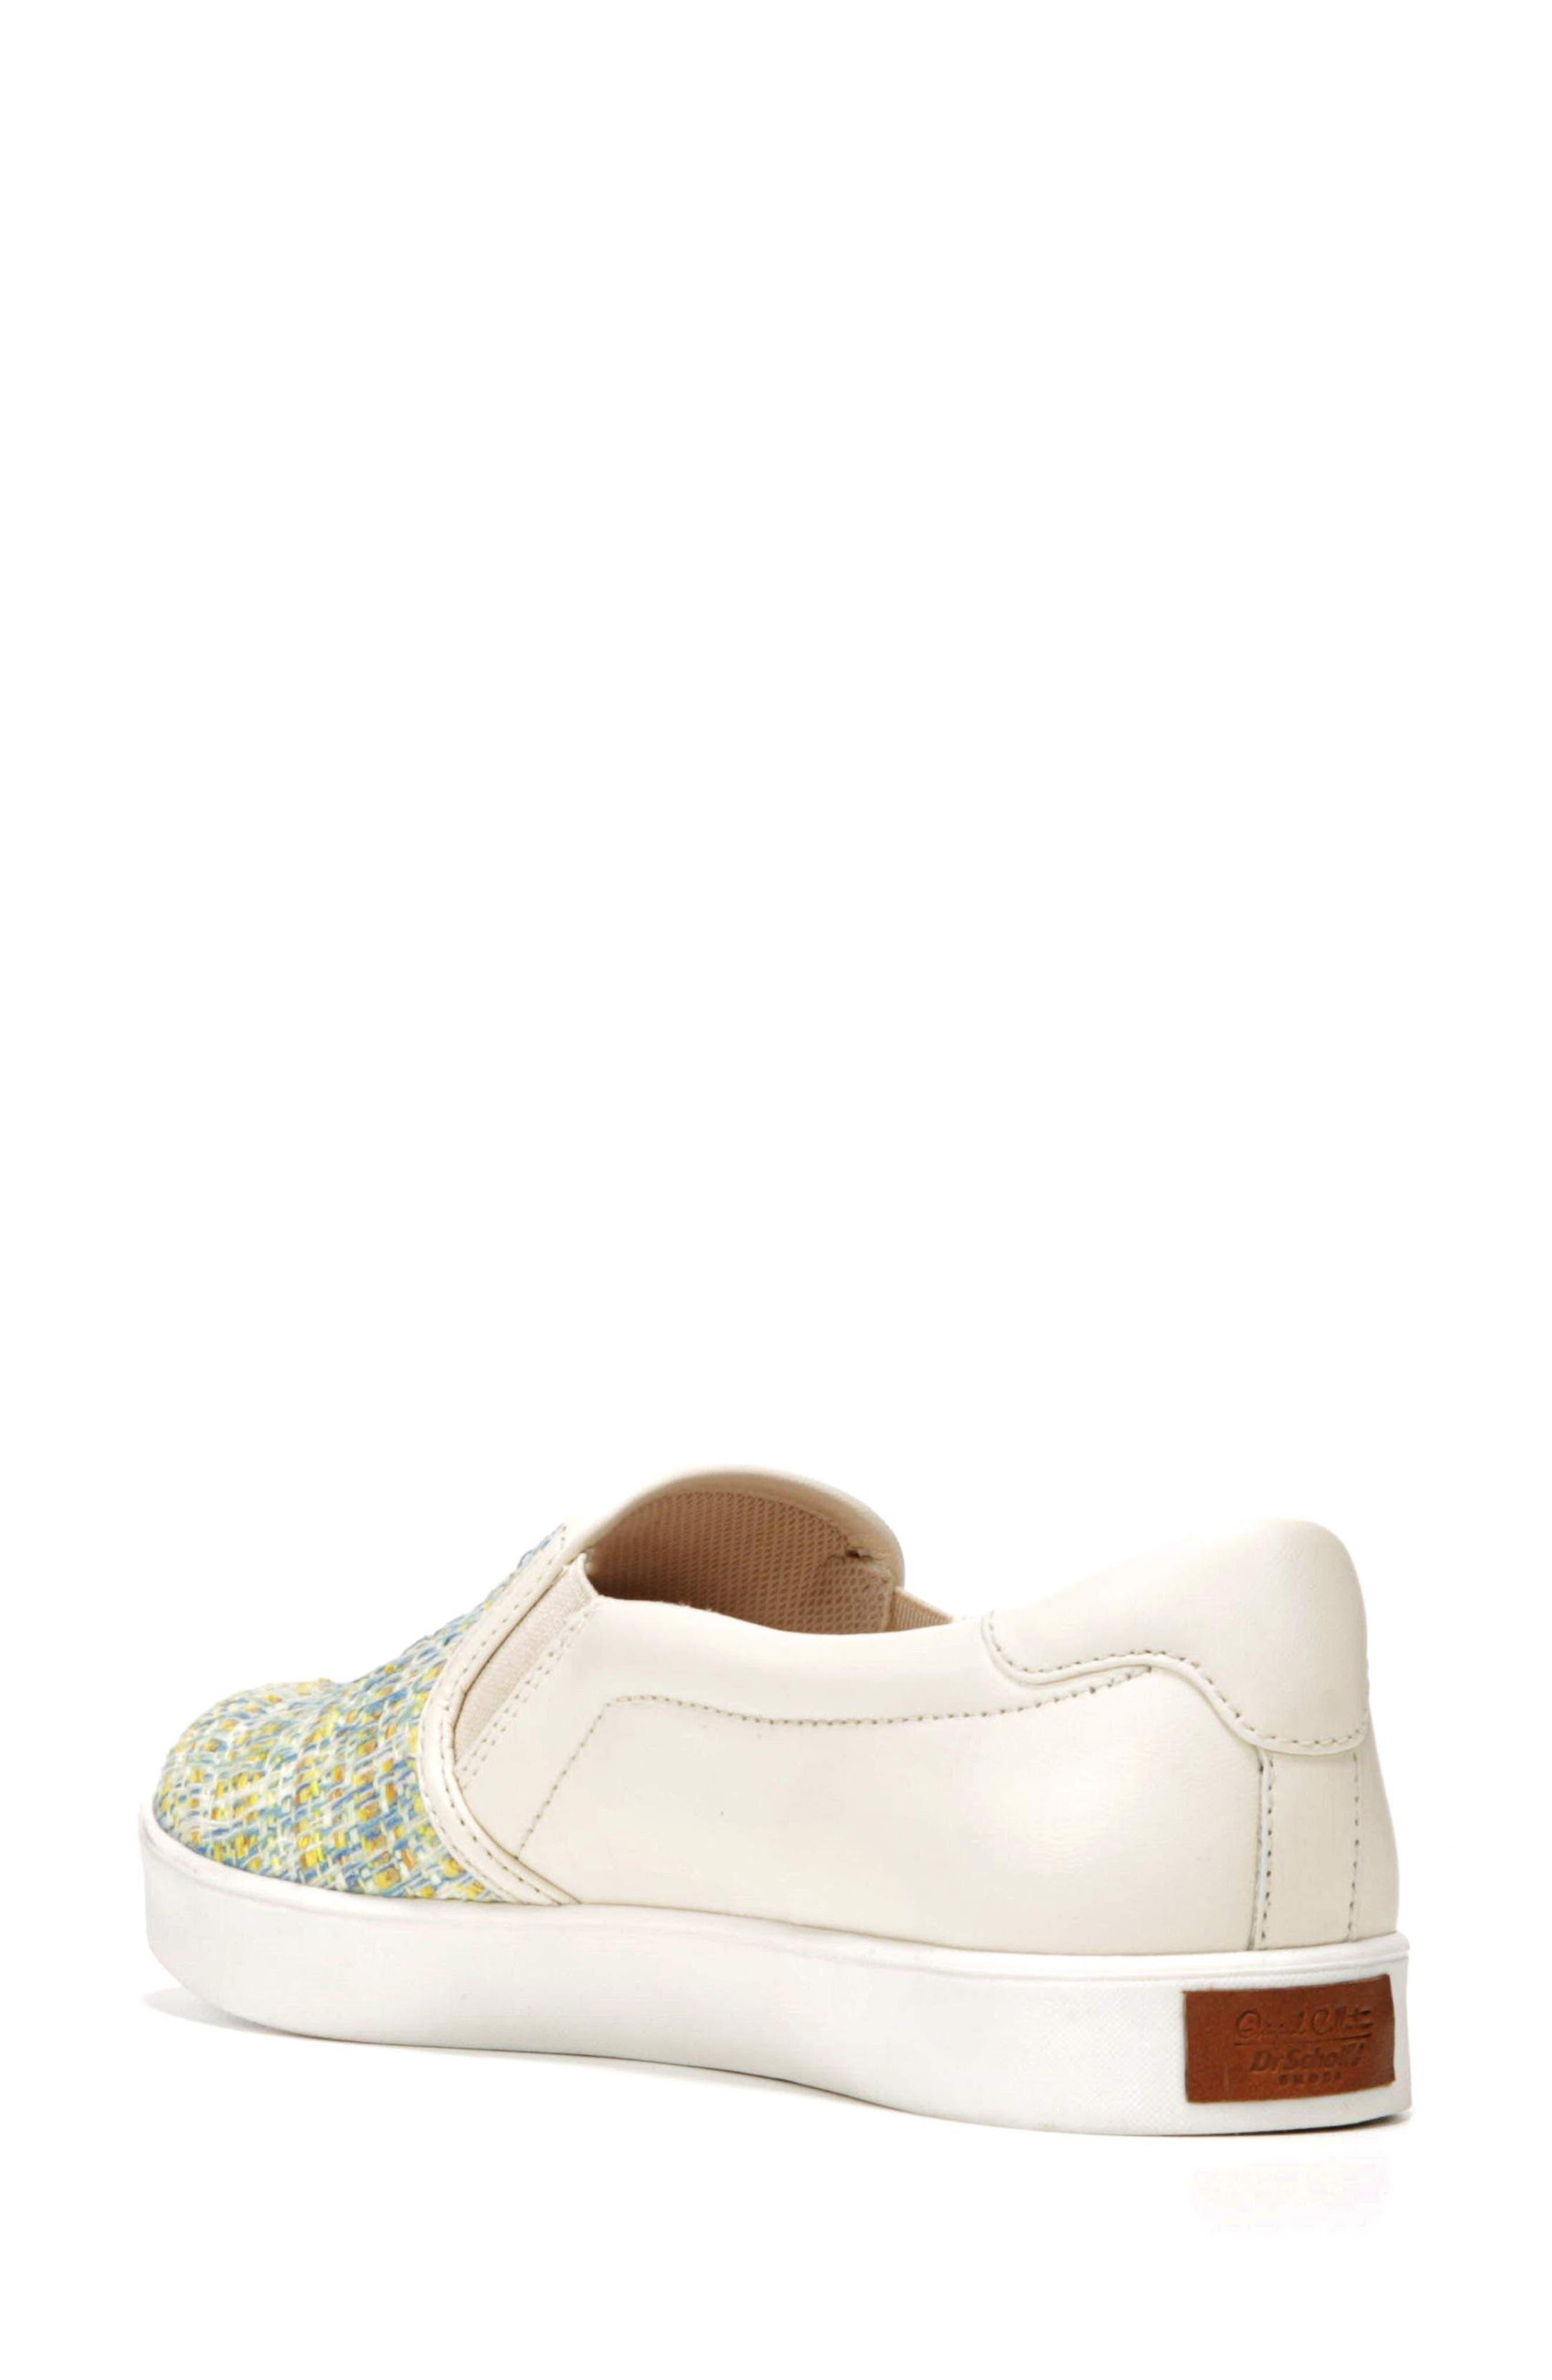 Alternate Image 2  - Dr. Scholl's Original Collection 'Scout' Slip On Sneaker (Women)